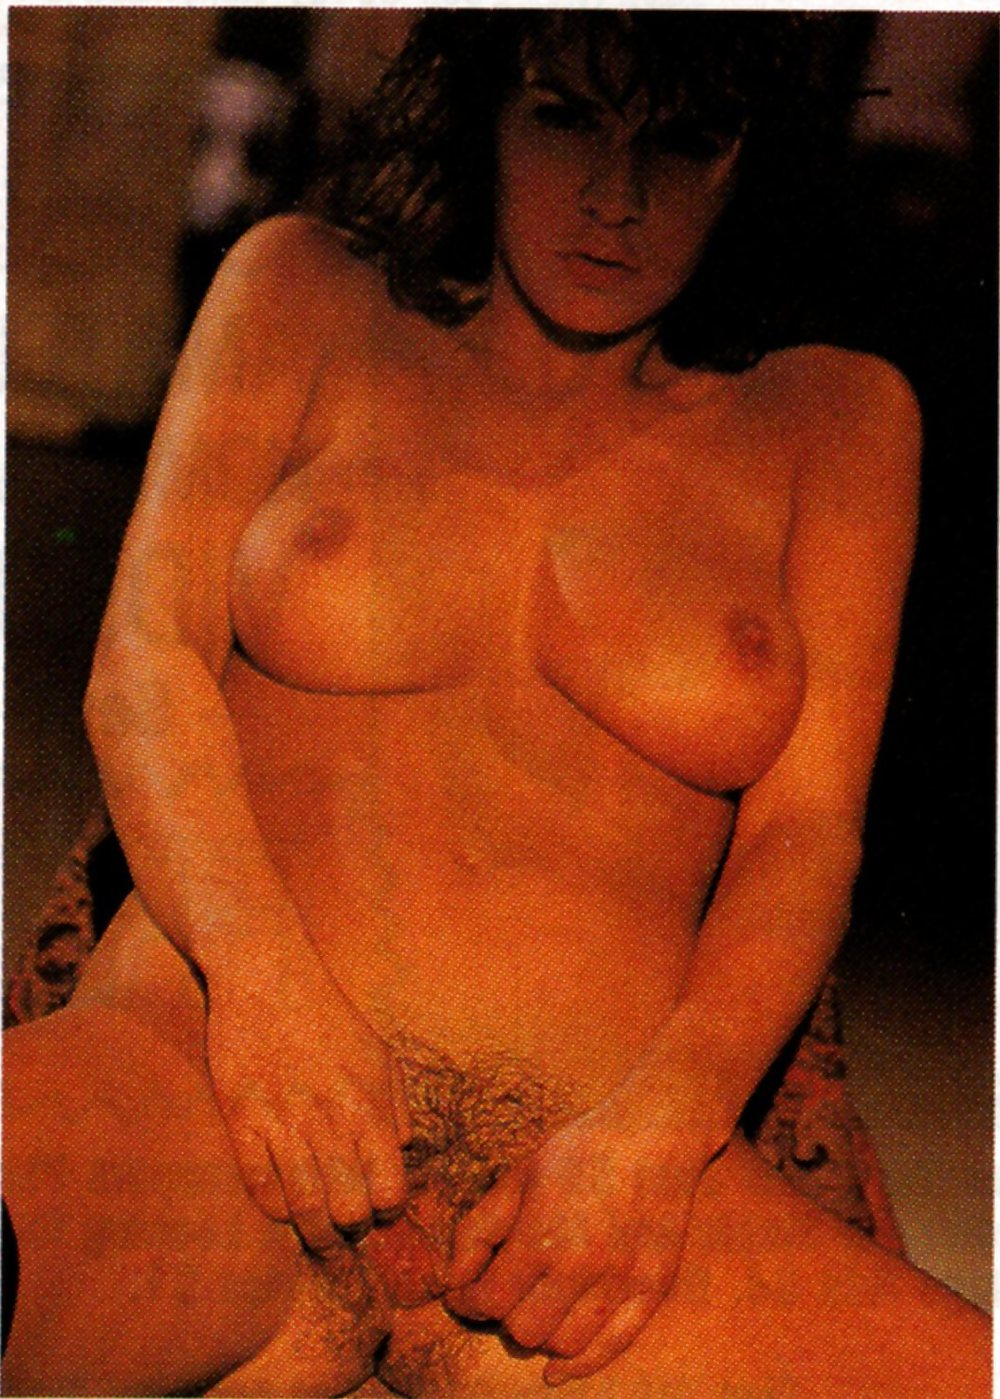 Exaggerate. model donna ewin nude think